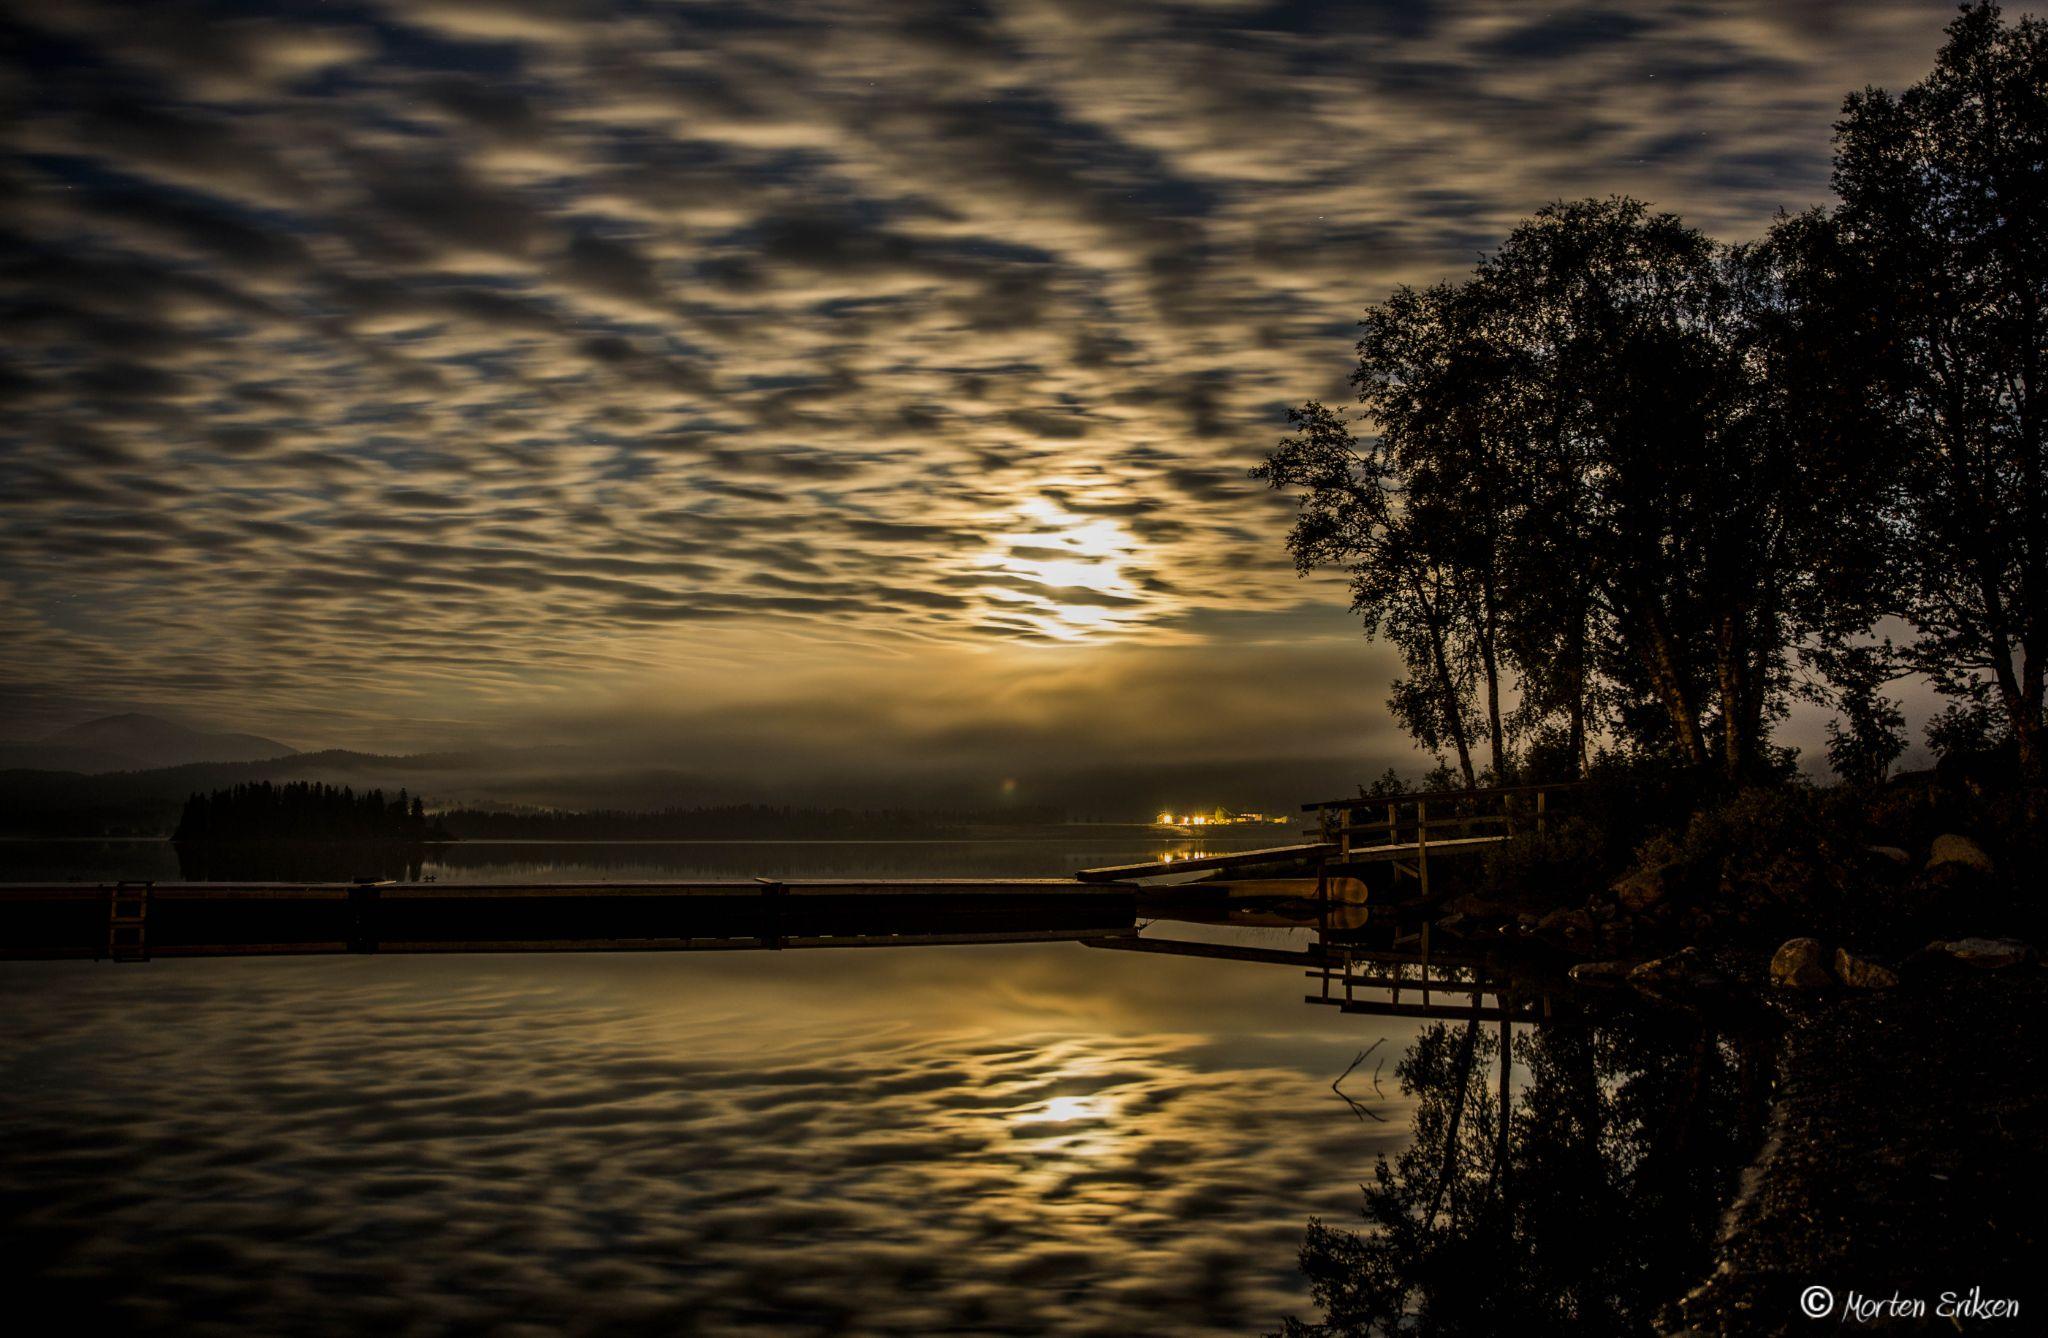 Moonlight by Morten Eriksen